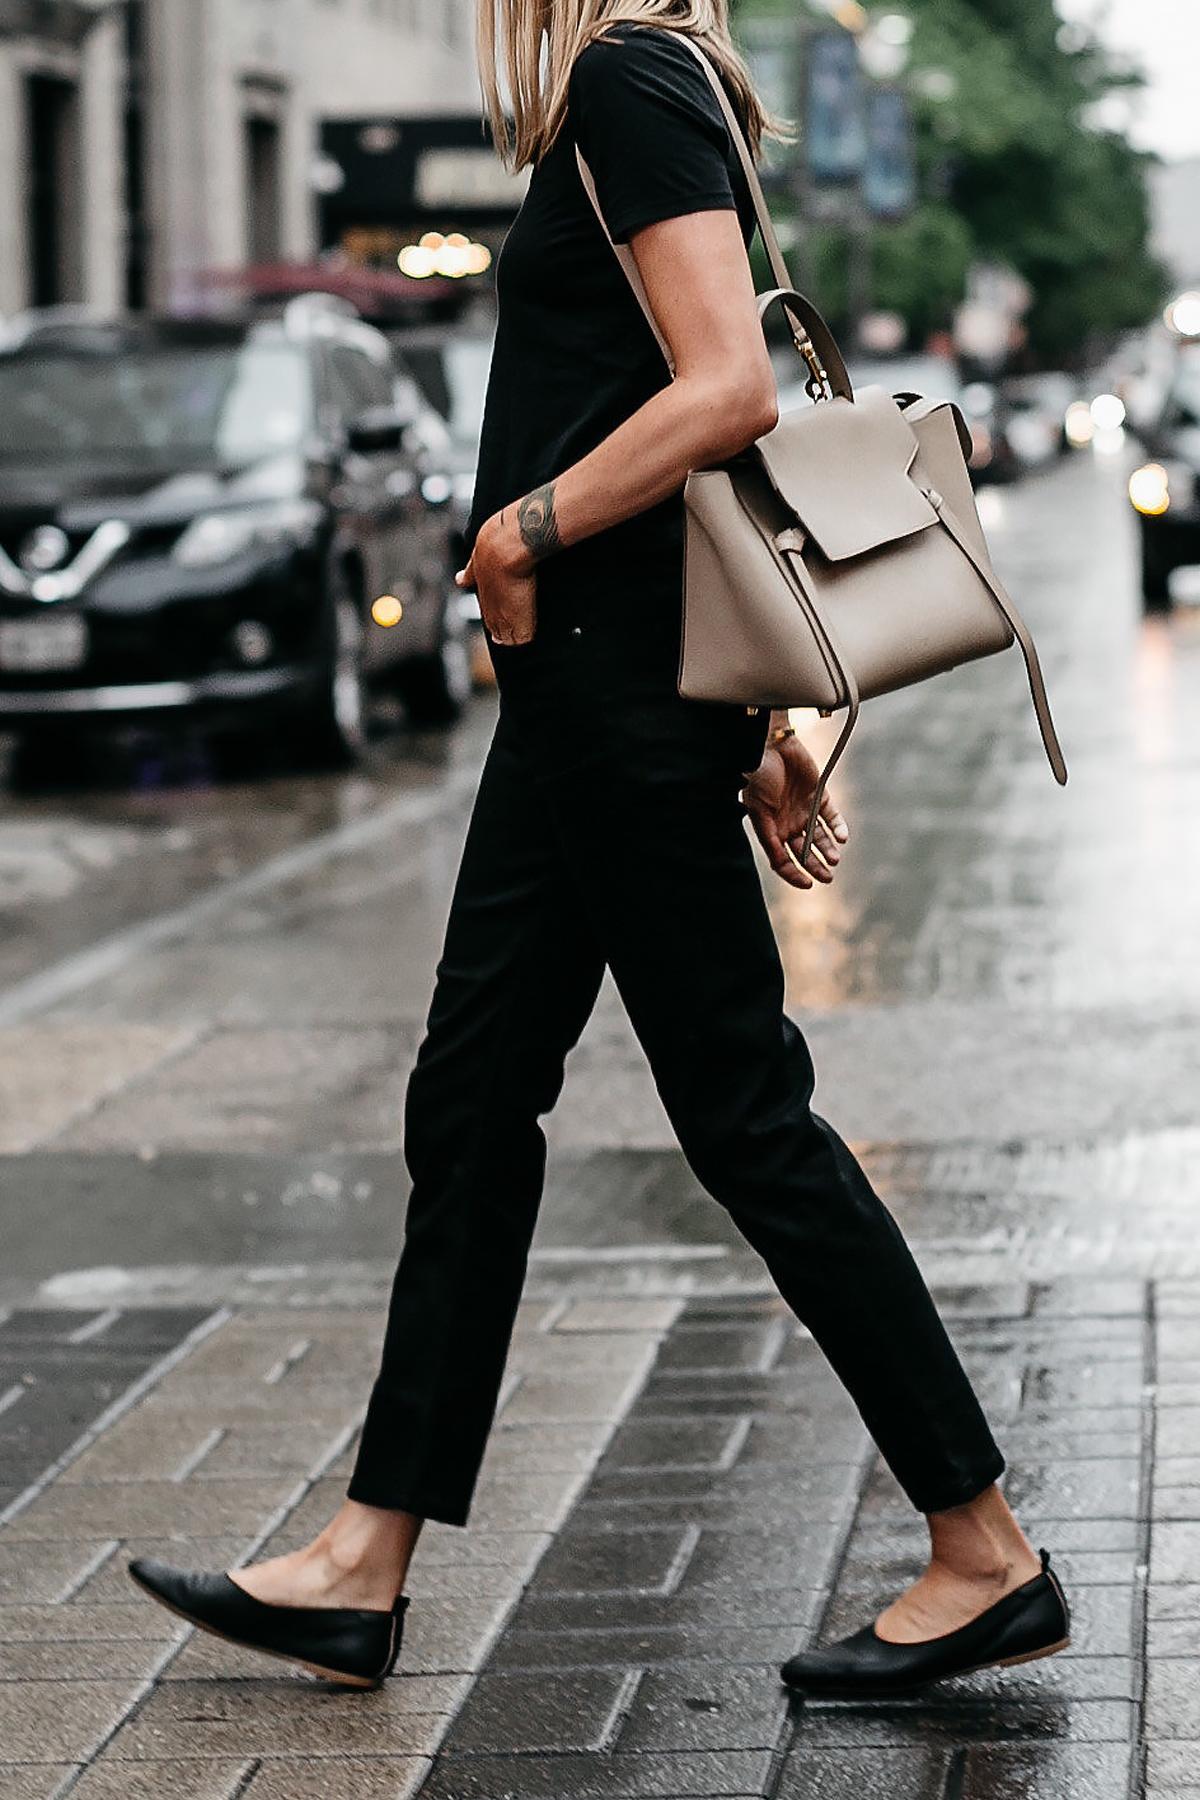 Woman Wearing Everlane Black Tshirt Everlane Black Boyfriend Jeans Everlane Black Day Glove Flats Celine Mini Belt Bag Fashion Jackson Dallas Blogger Fashion Blogger Street Style